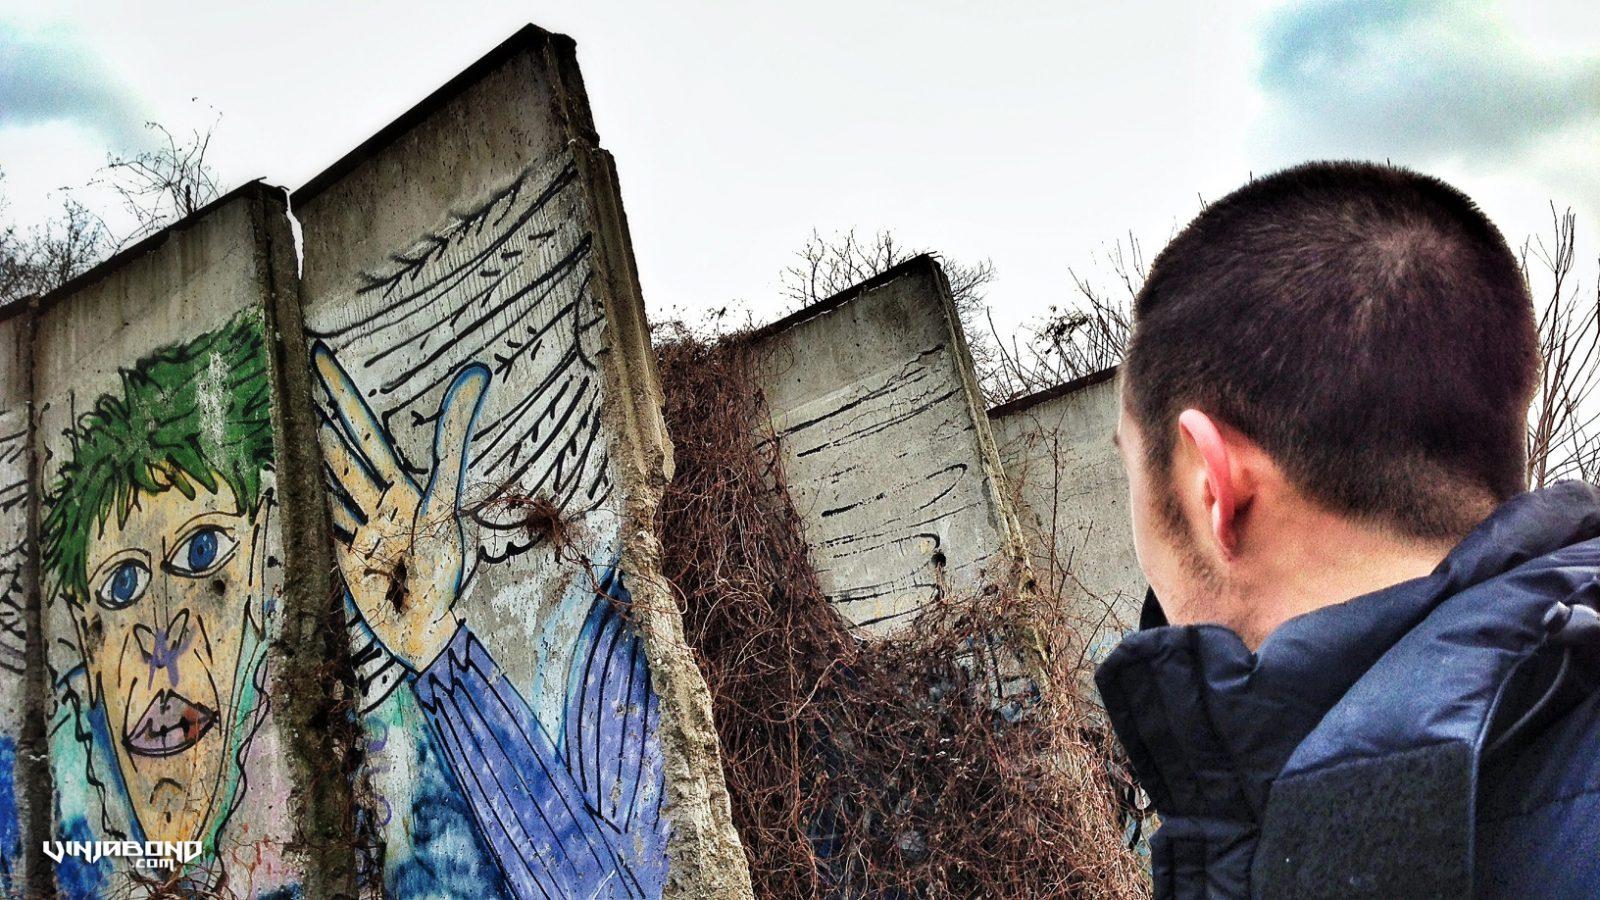 Remnants of the Berlin Wall in Germany /// Vagabonding - VINJABOND